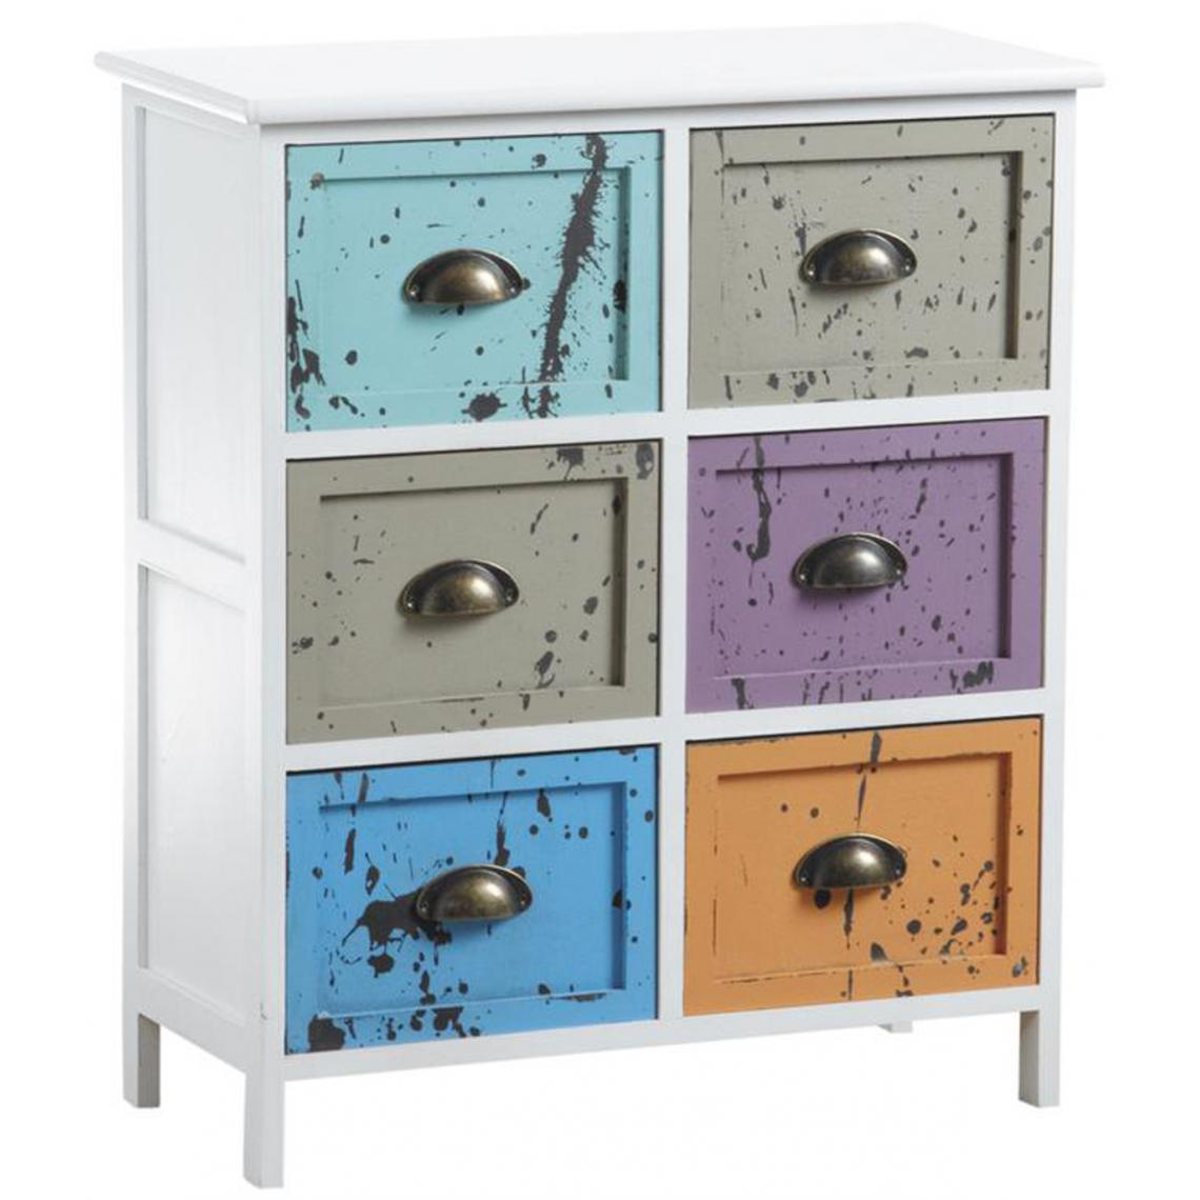 Pegane Commode multicolore en bois avec 6 tiroirs - 60 x 28 x 70 cm -PEGANE-